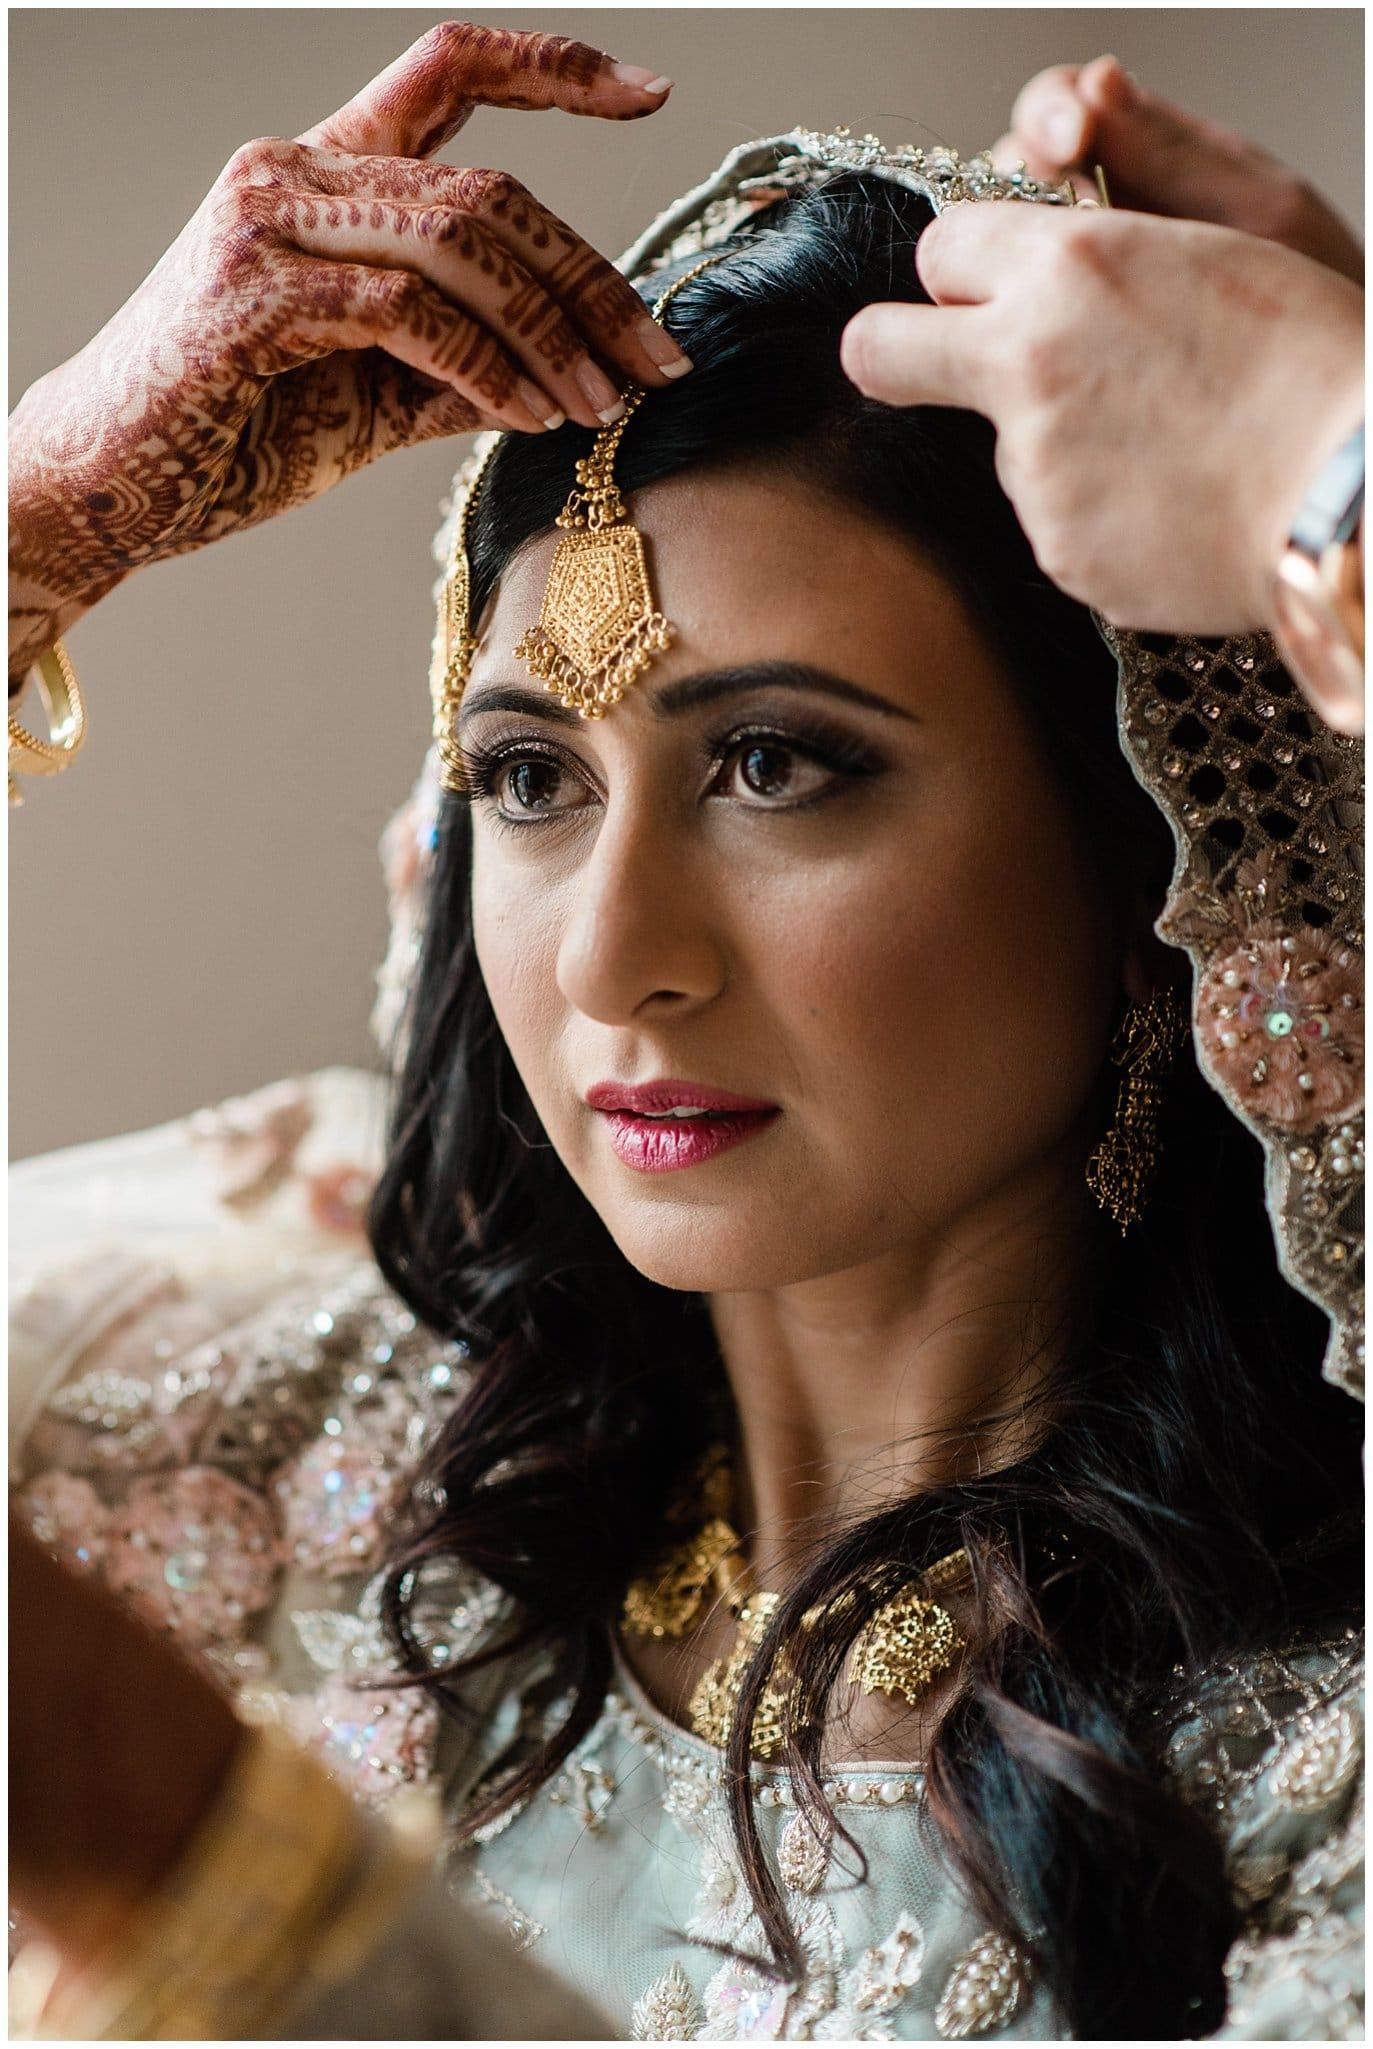 bride putting on dupatta before wedding Nikah photo